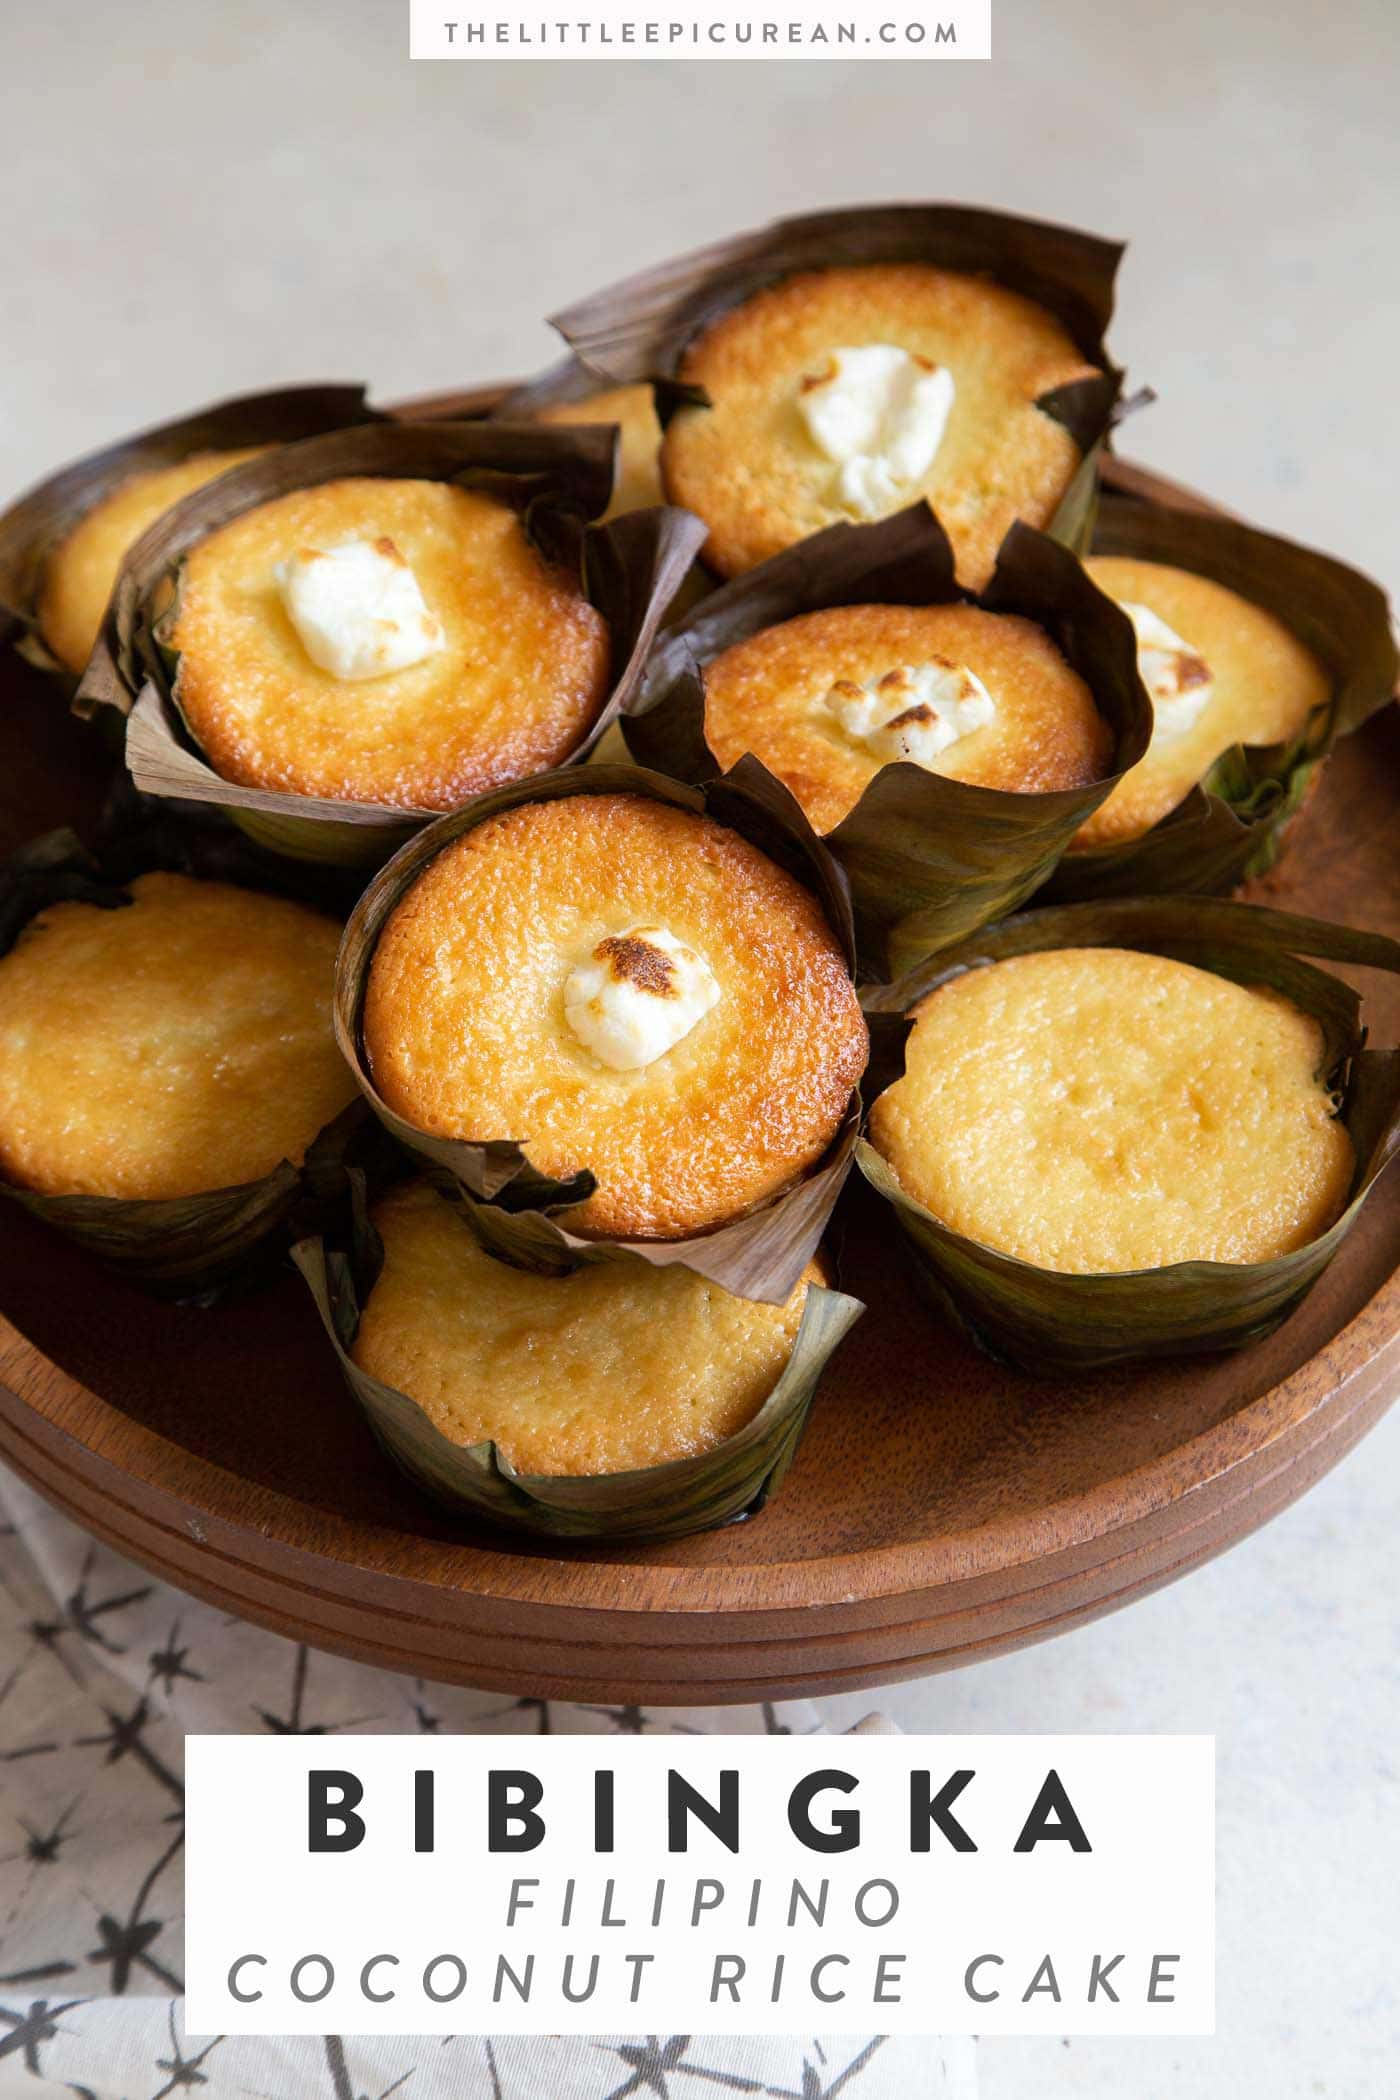 Bibingka Coconut Rice Cake